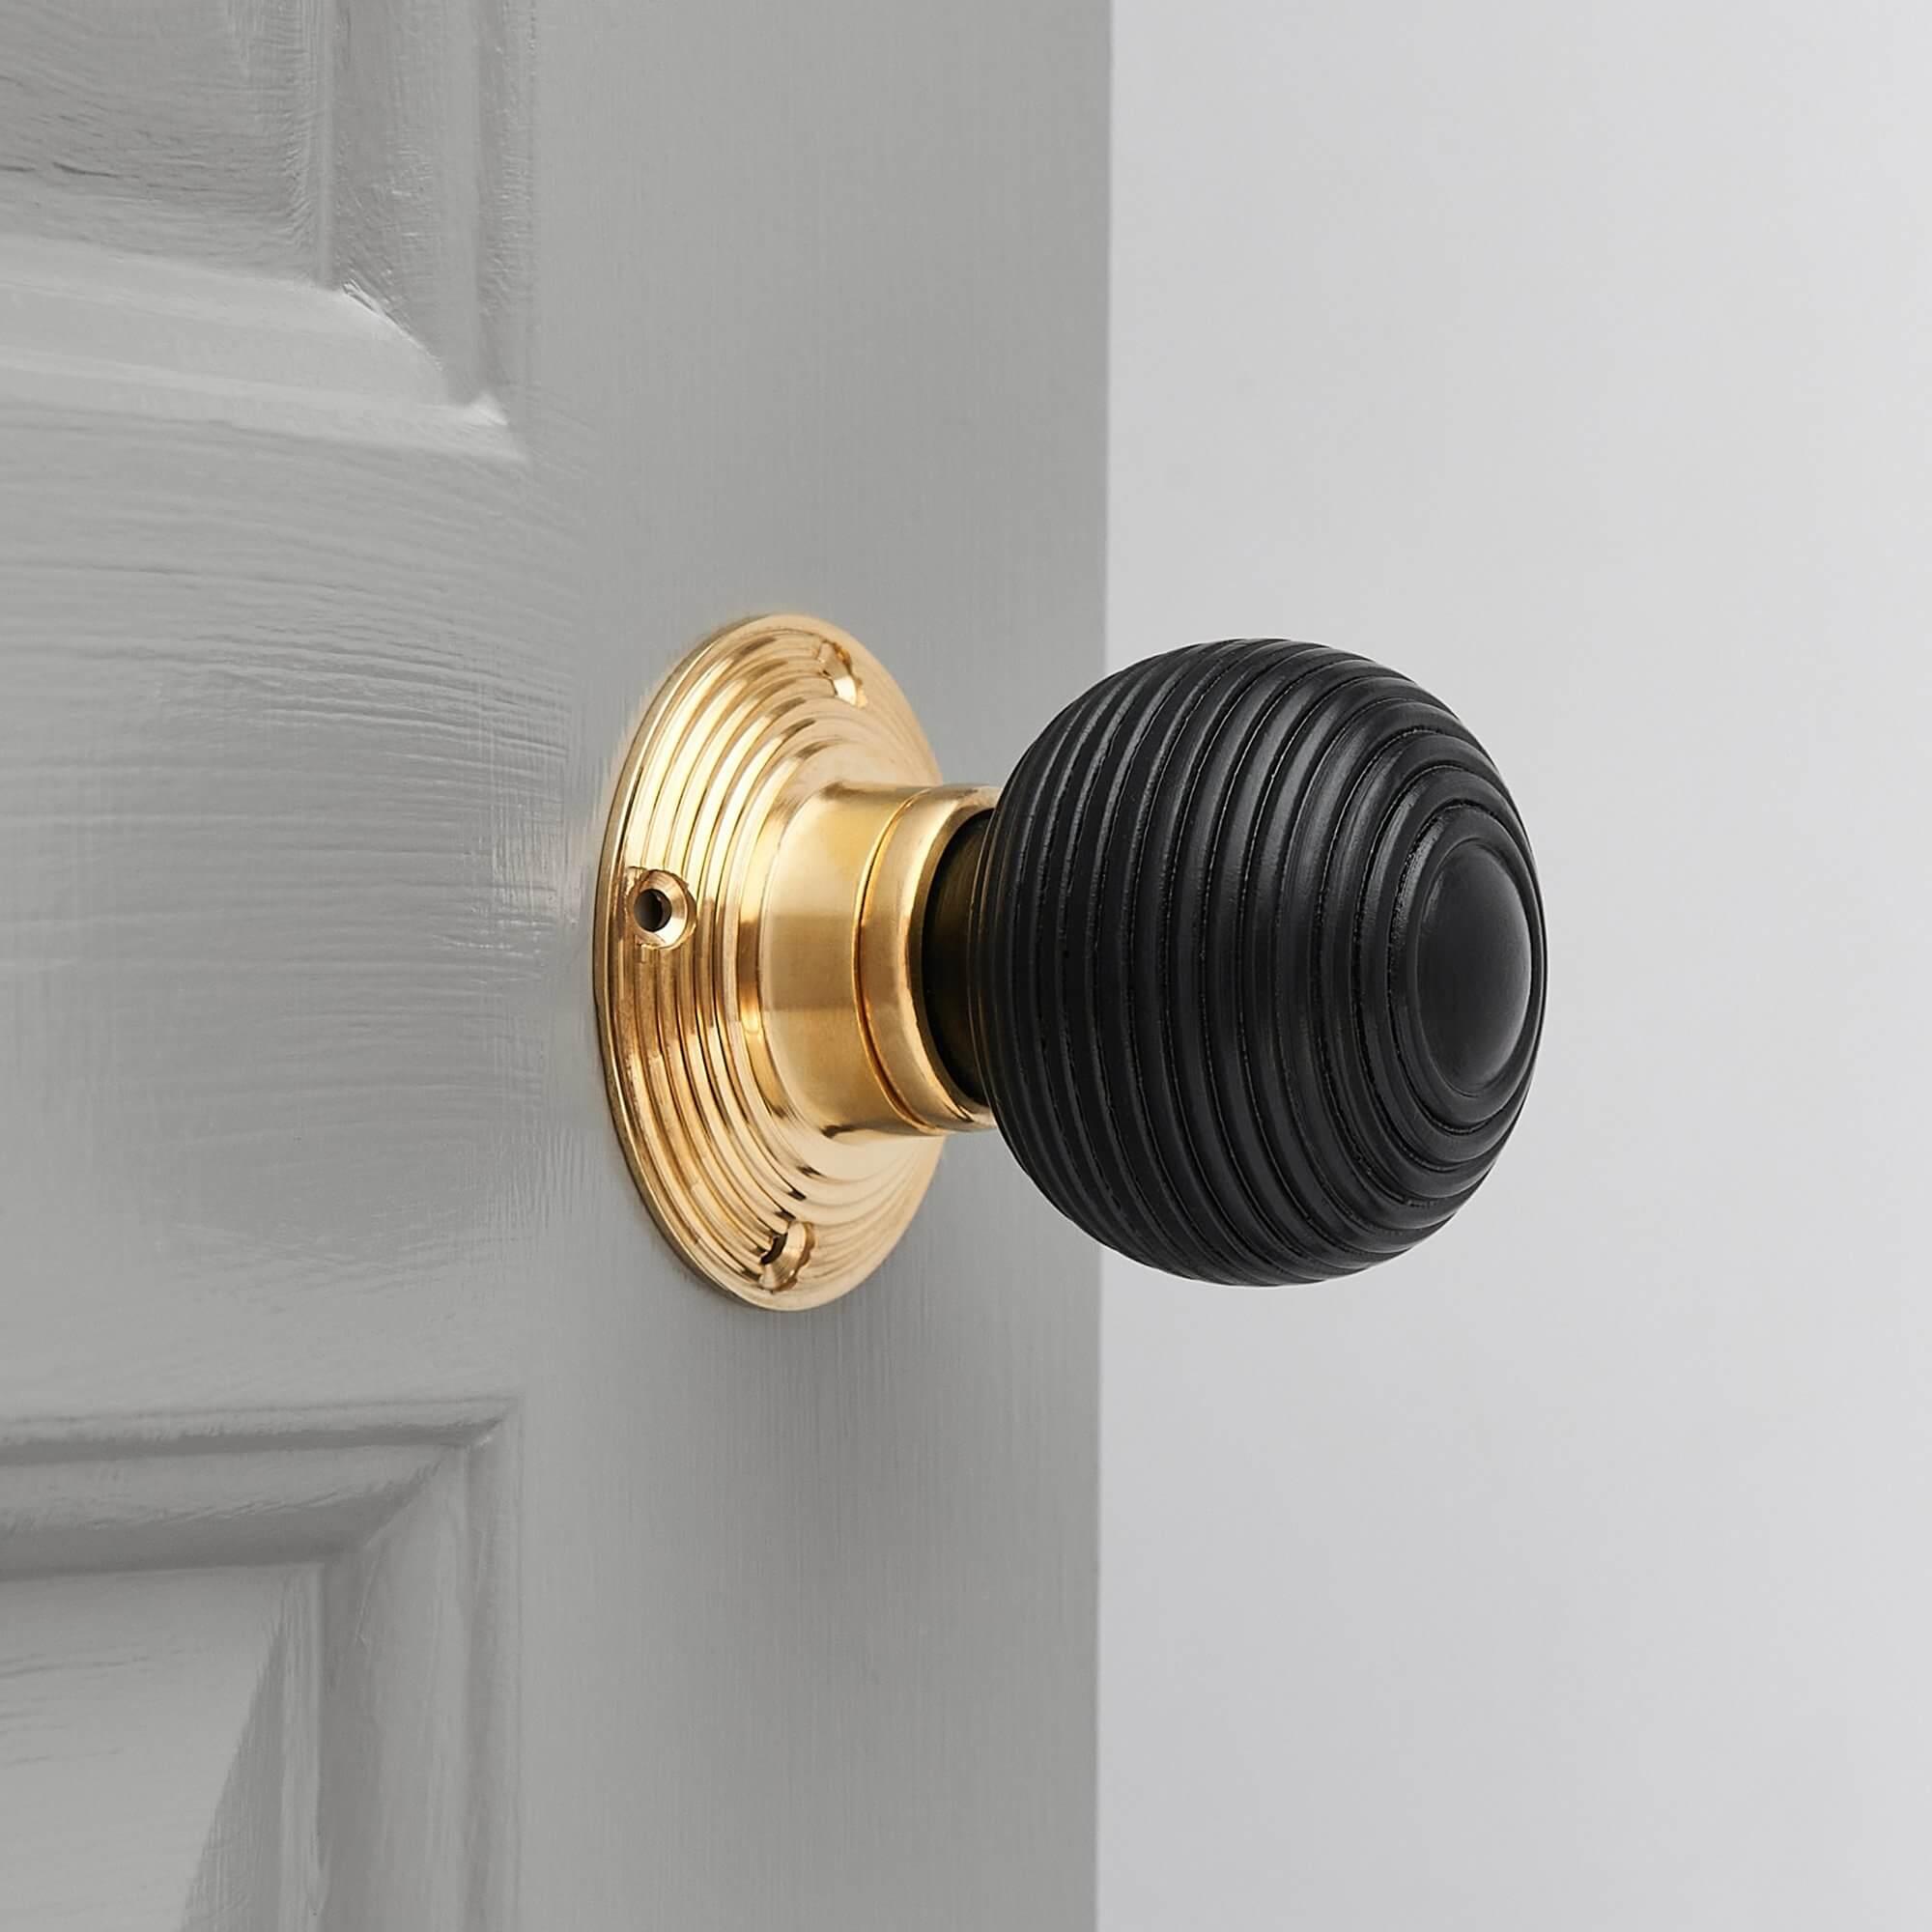 Ebonised Beehive Door Knobs (Pair) - Polished Brass Collar & Rose